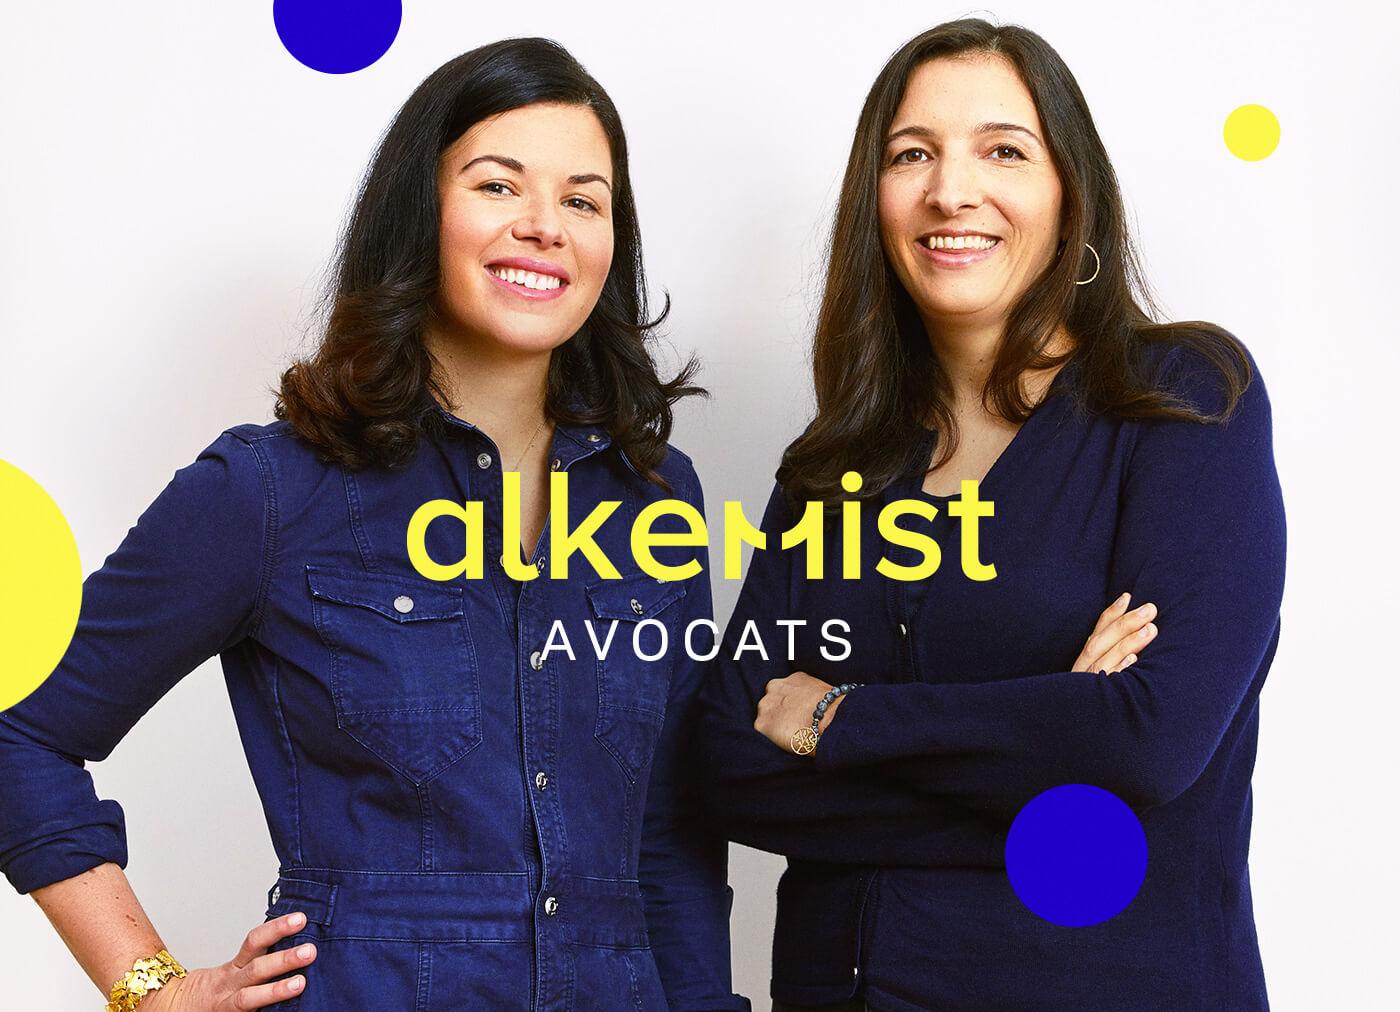 Alkemist Avocats